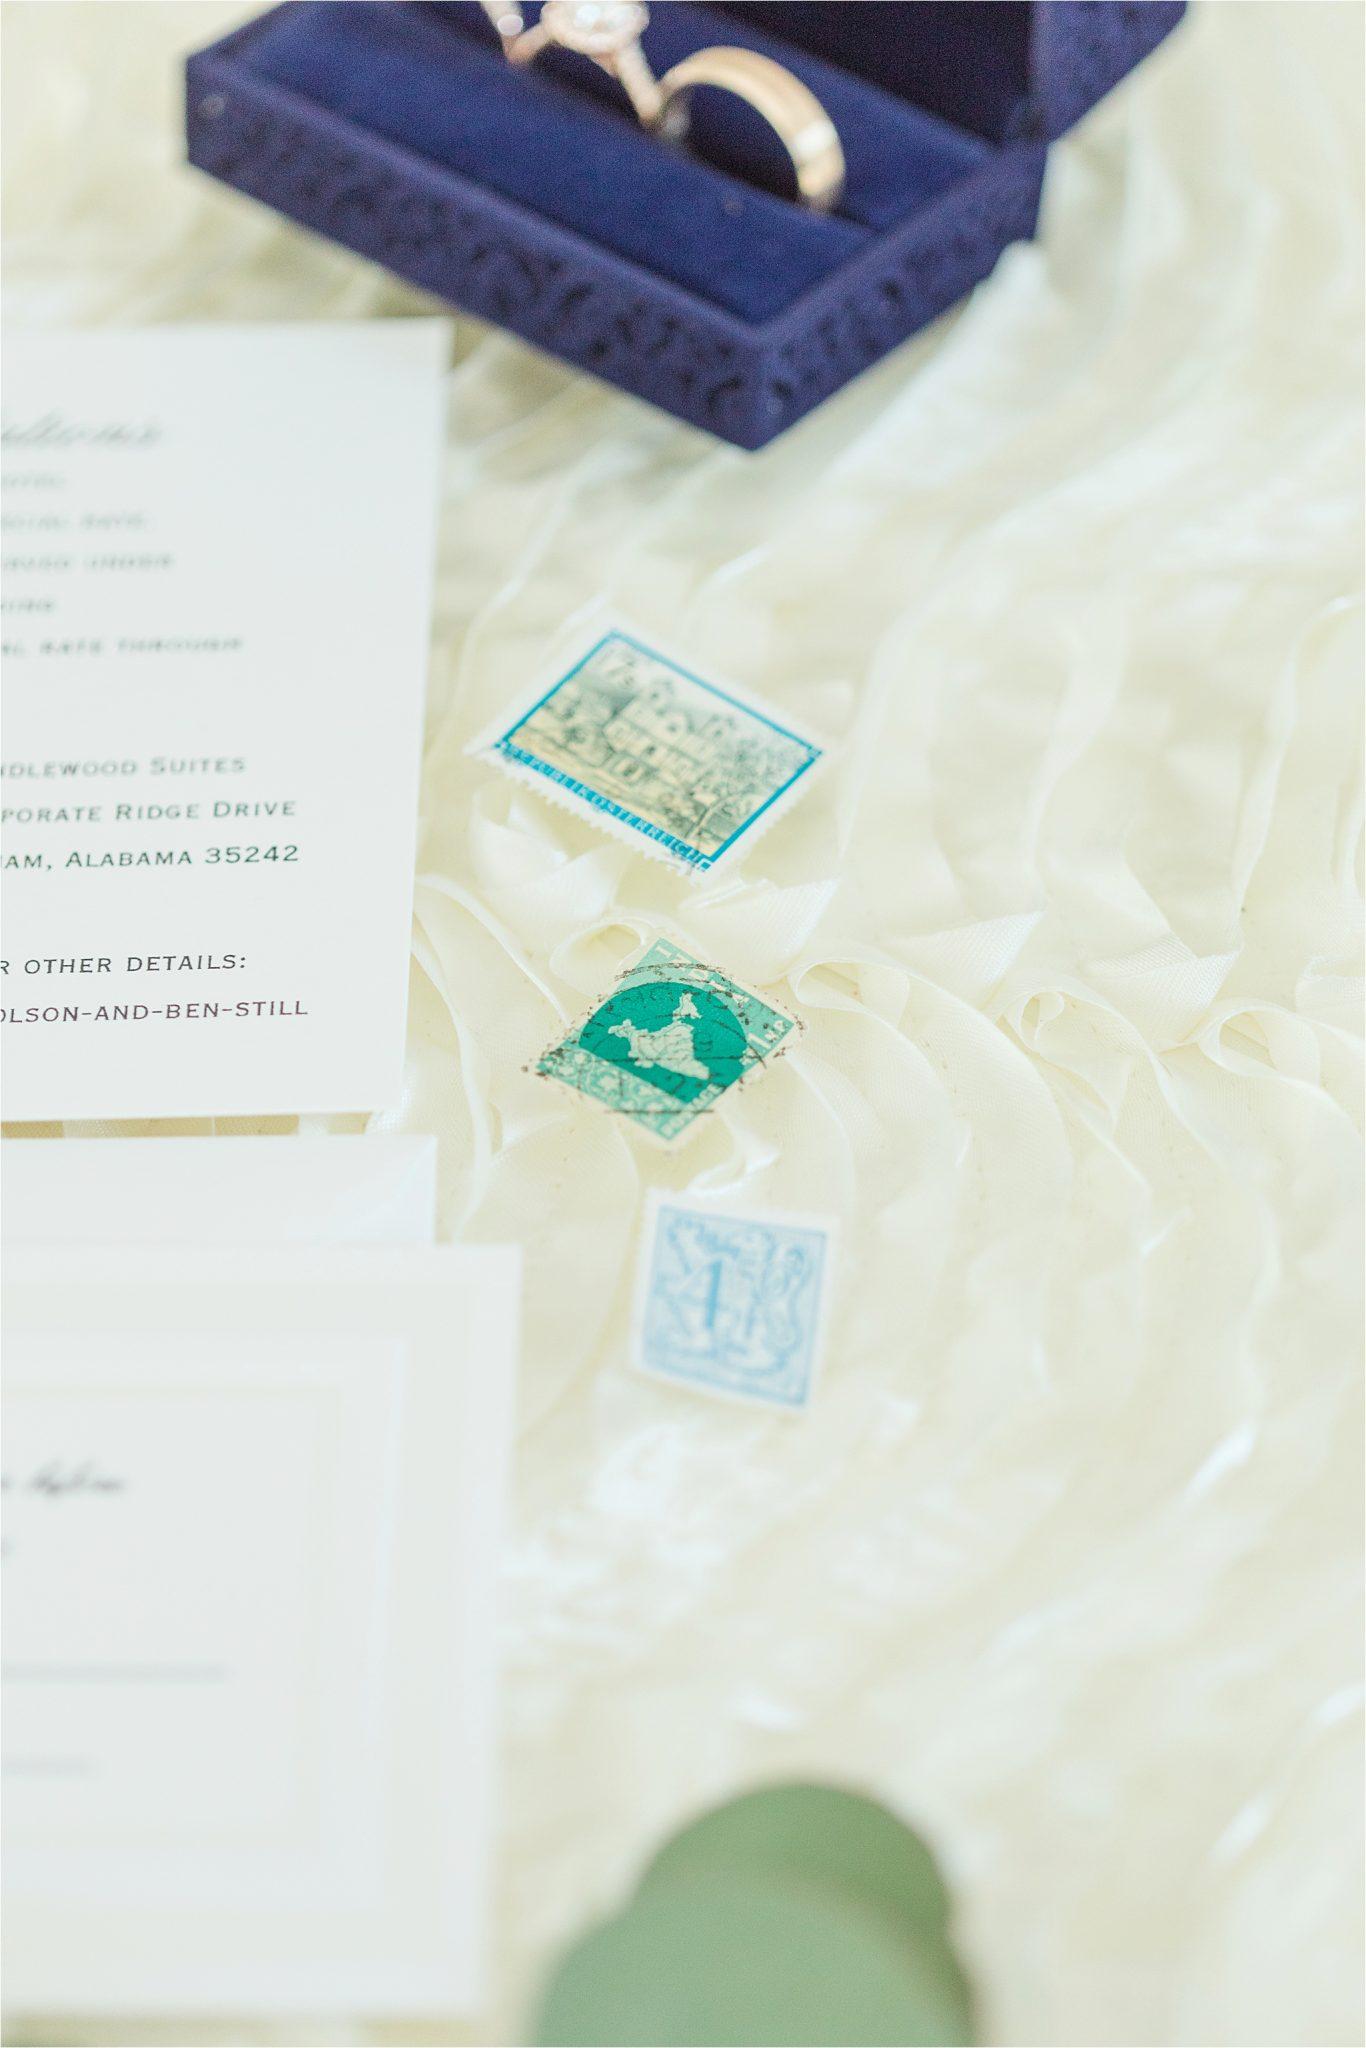 Sonnet House, Birmingham Alabama Wedding Photographer, Wedding ring, wedding jewelry, wedding details